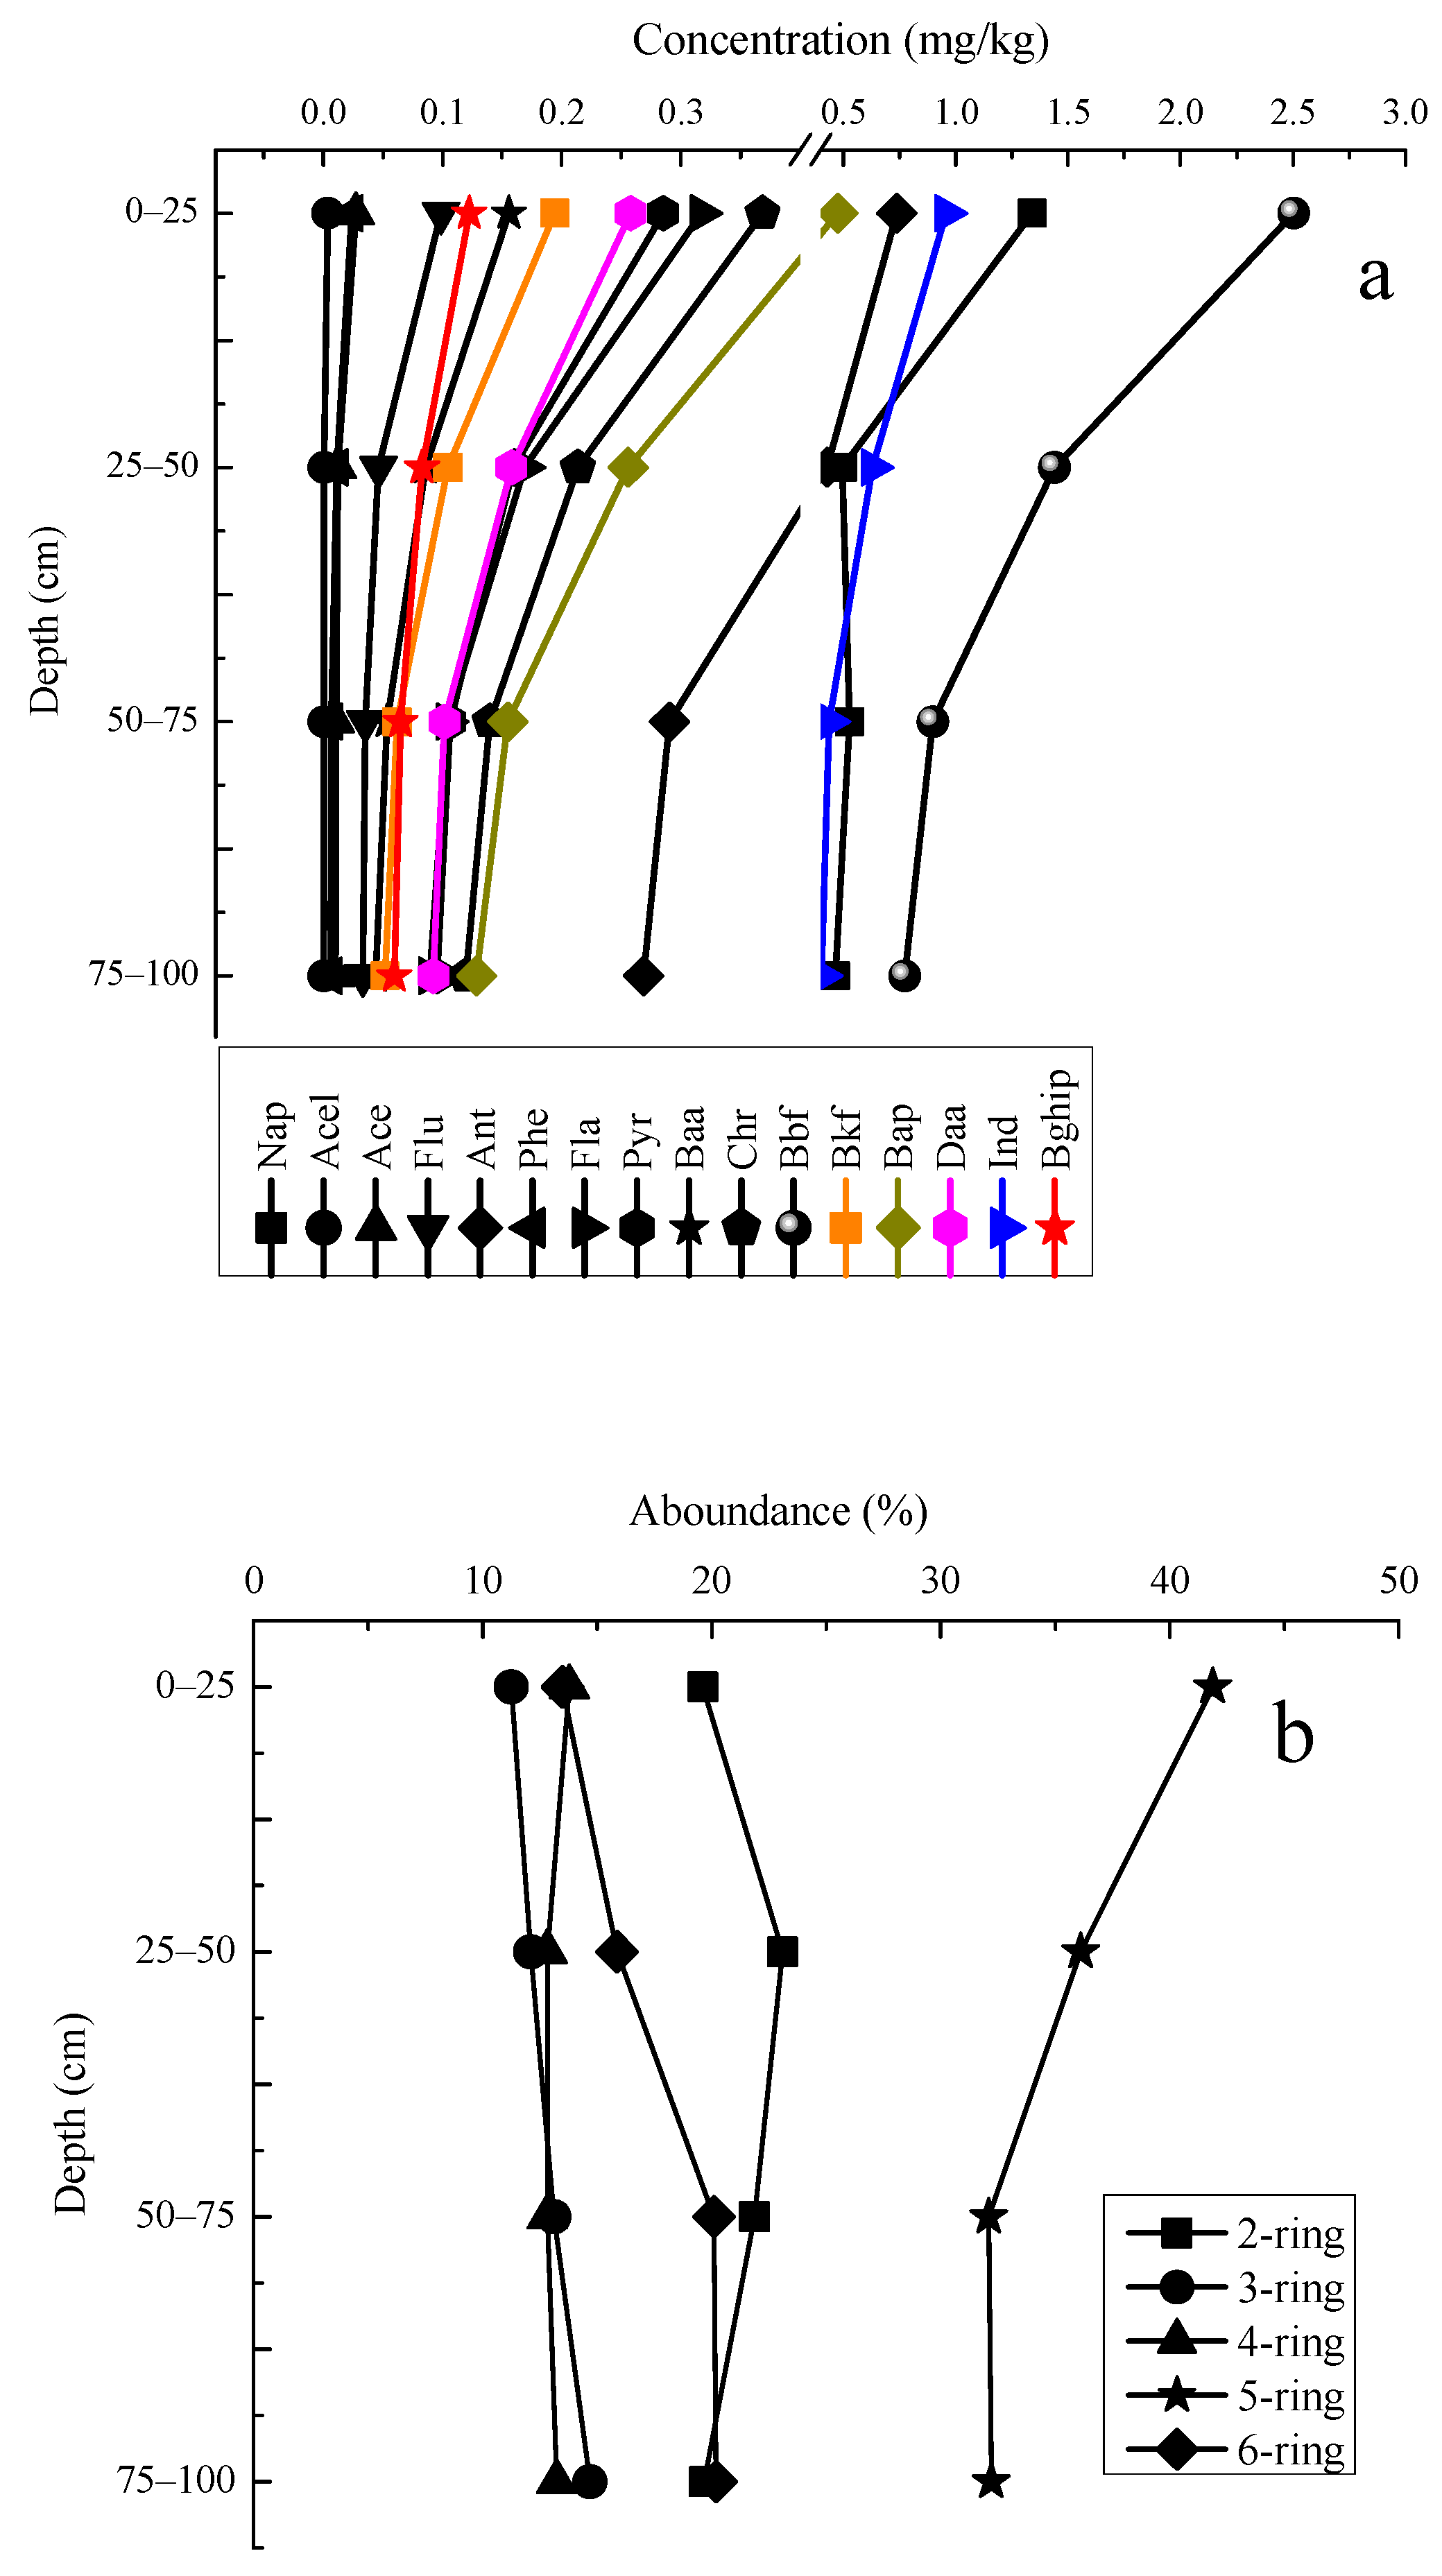 rheostat 110 volt wiring diagram rheostat wiring